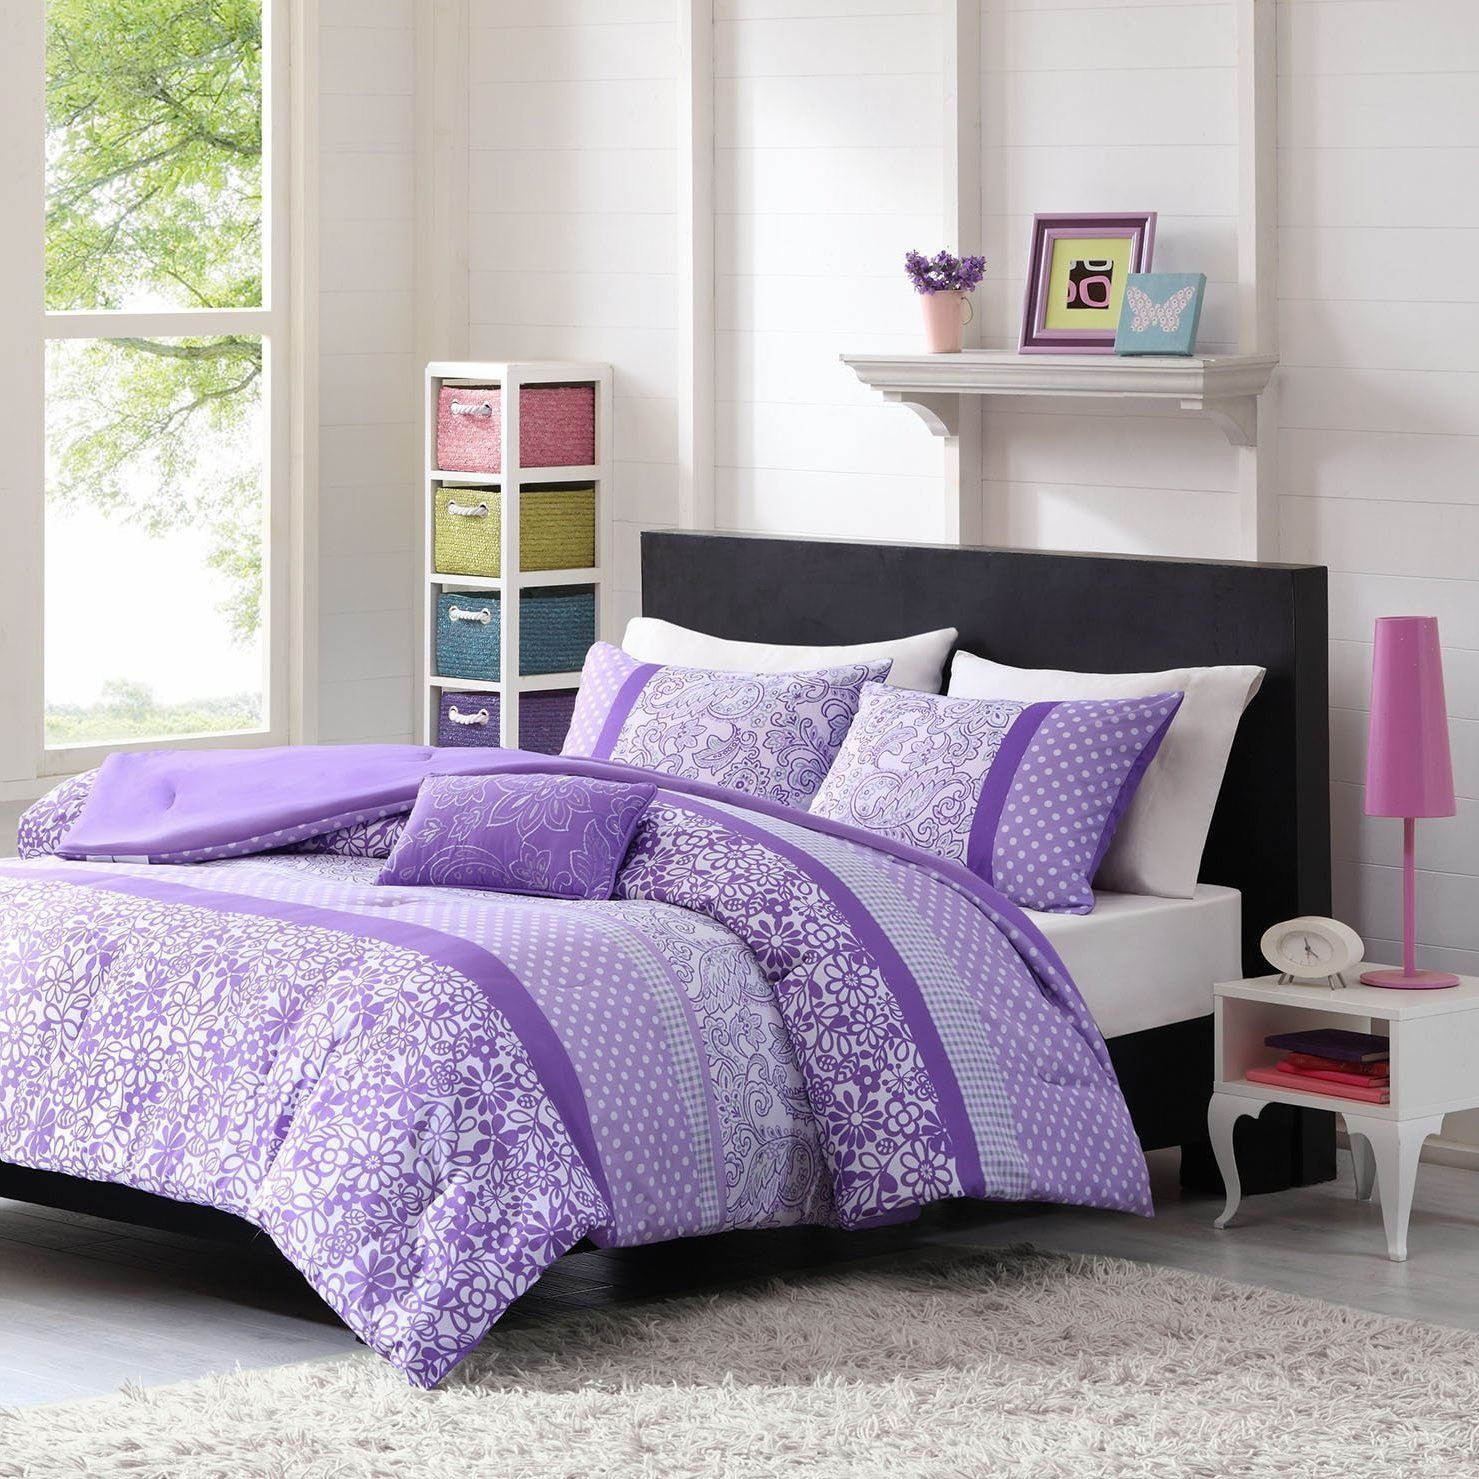 4 Piece Girls Purple White Floral Scroll Motif Comforter